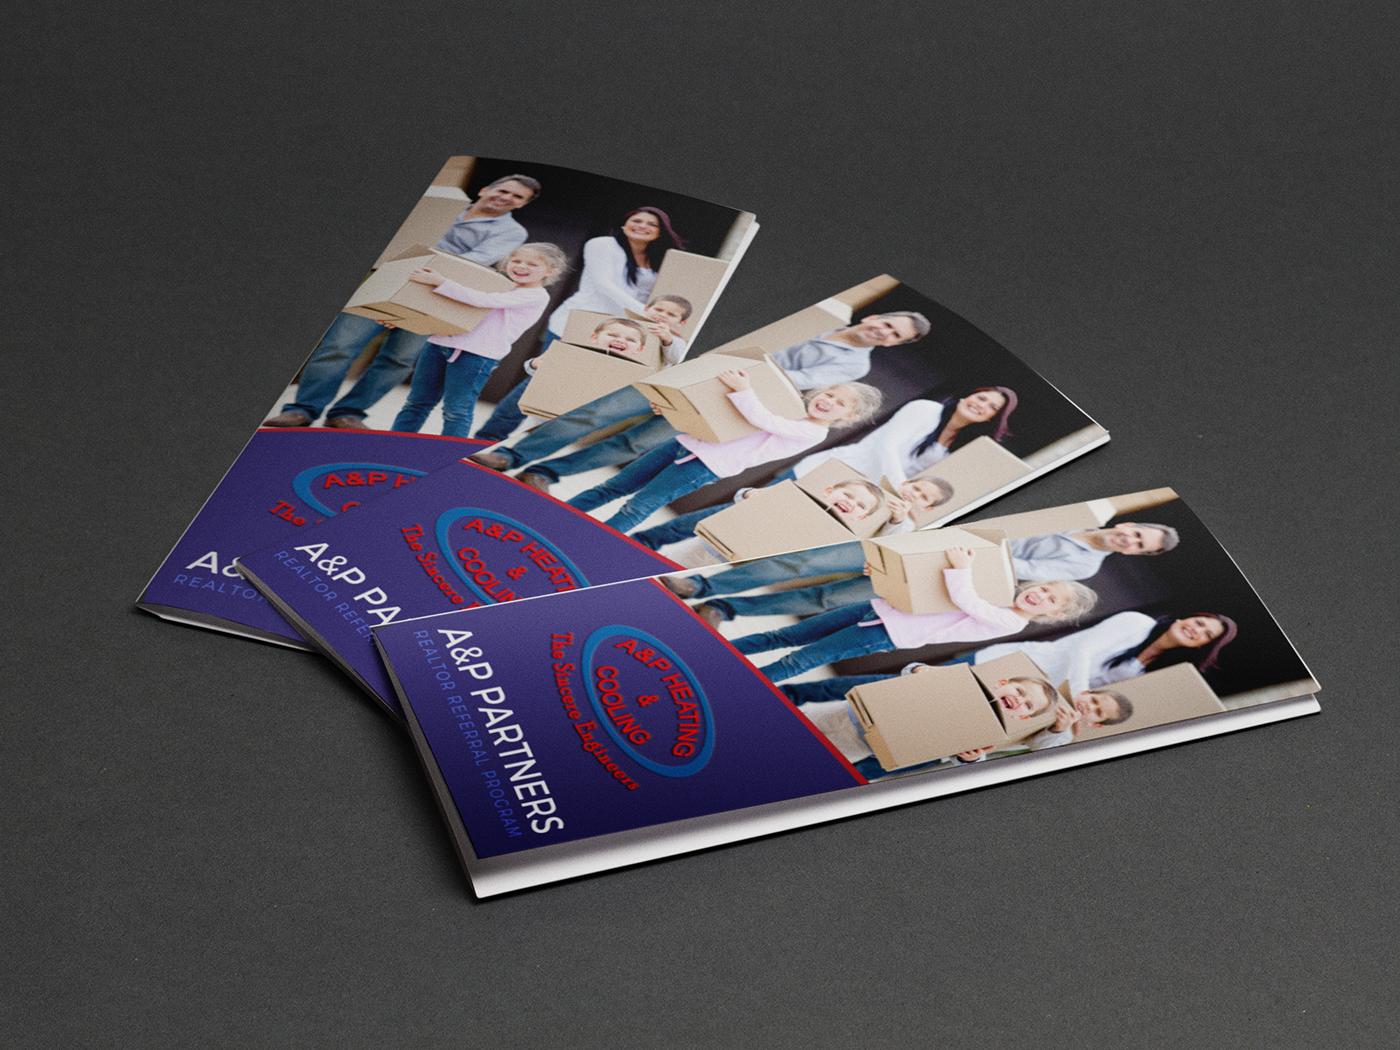 branding  Advertising  graphic design  print design